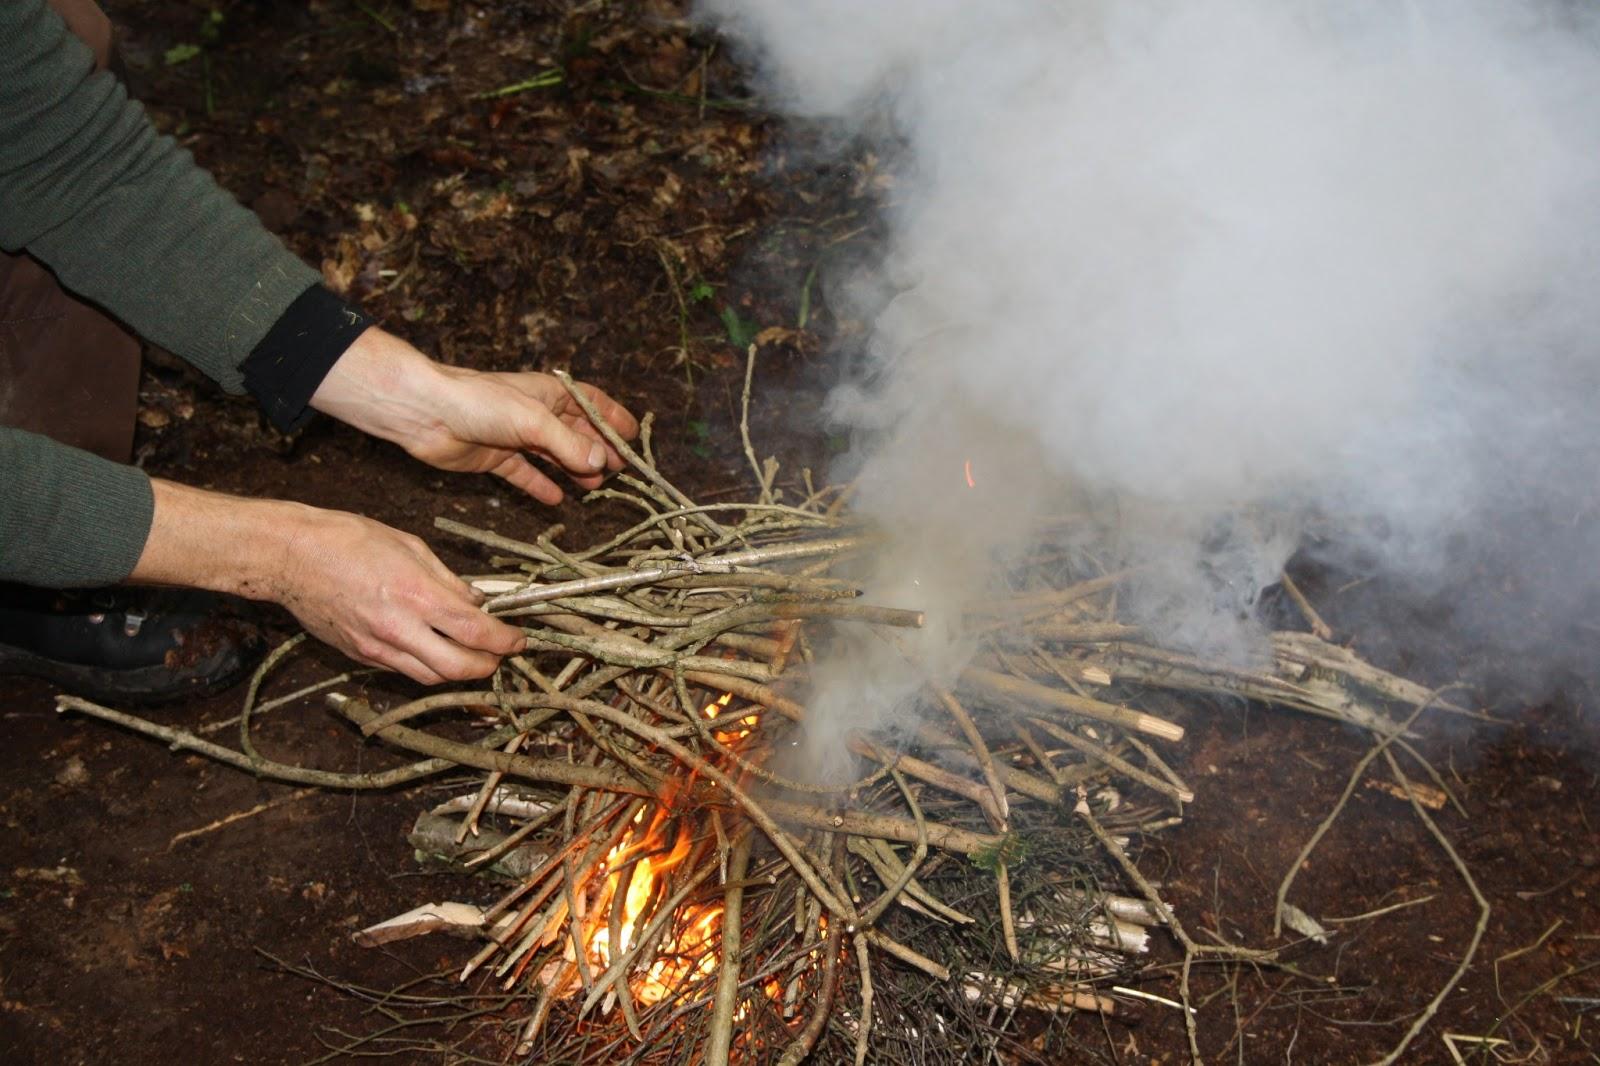 wilderness survival skills and bushcraft antics fire lighting